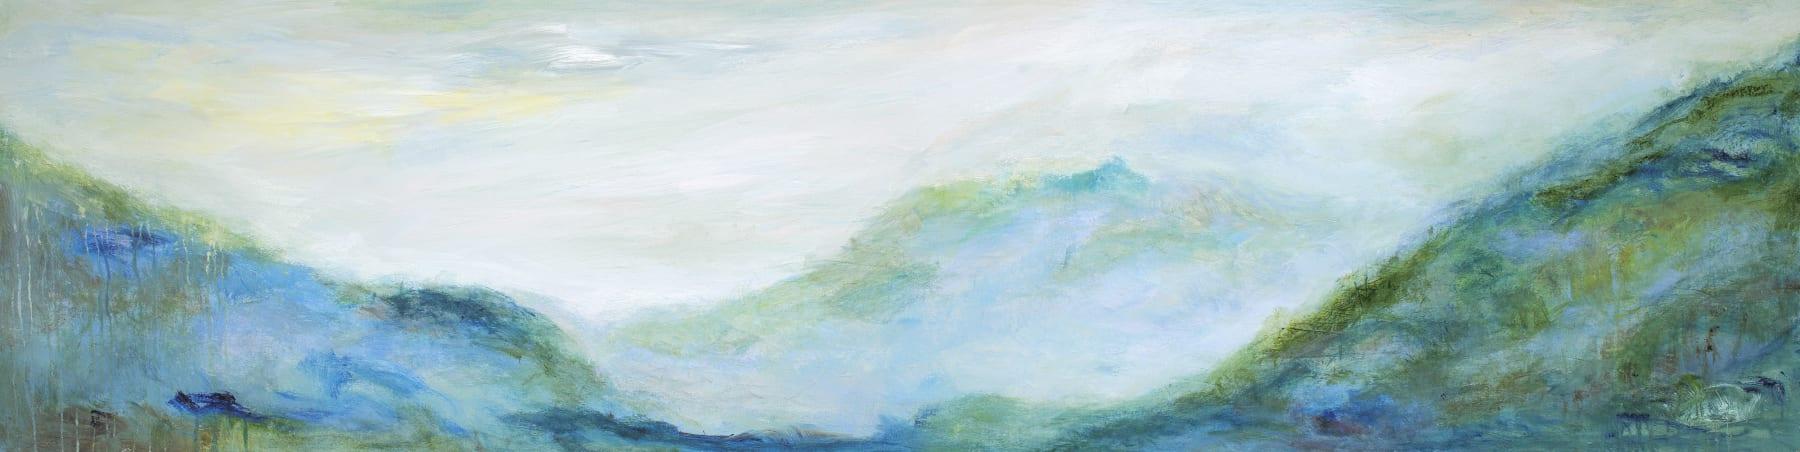 Patricia Qualls, Mountains to the Sea, 2020